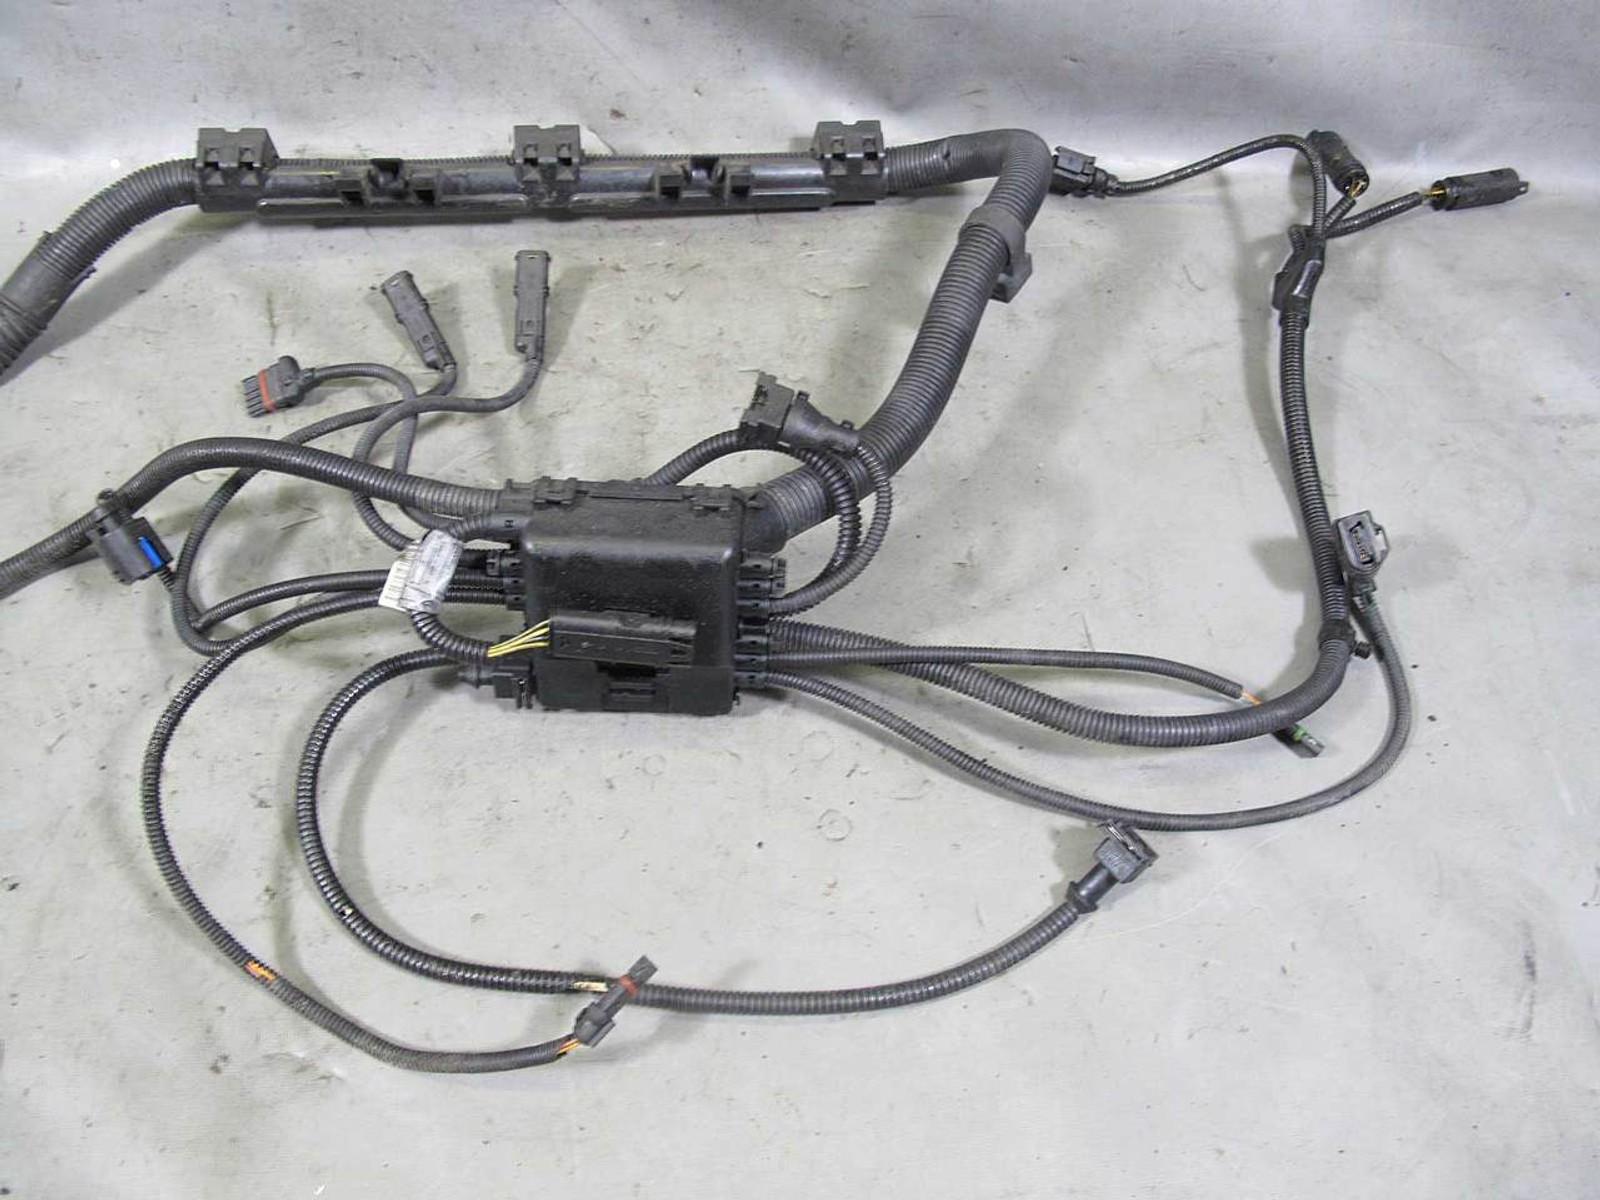 Bmw 328 Wiring Harness Electrical Diagrams Go Kart Early 2007 E90 E92 N51 N52 6 Cylinder Engine